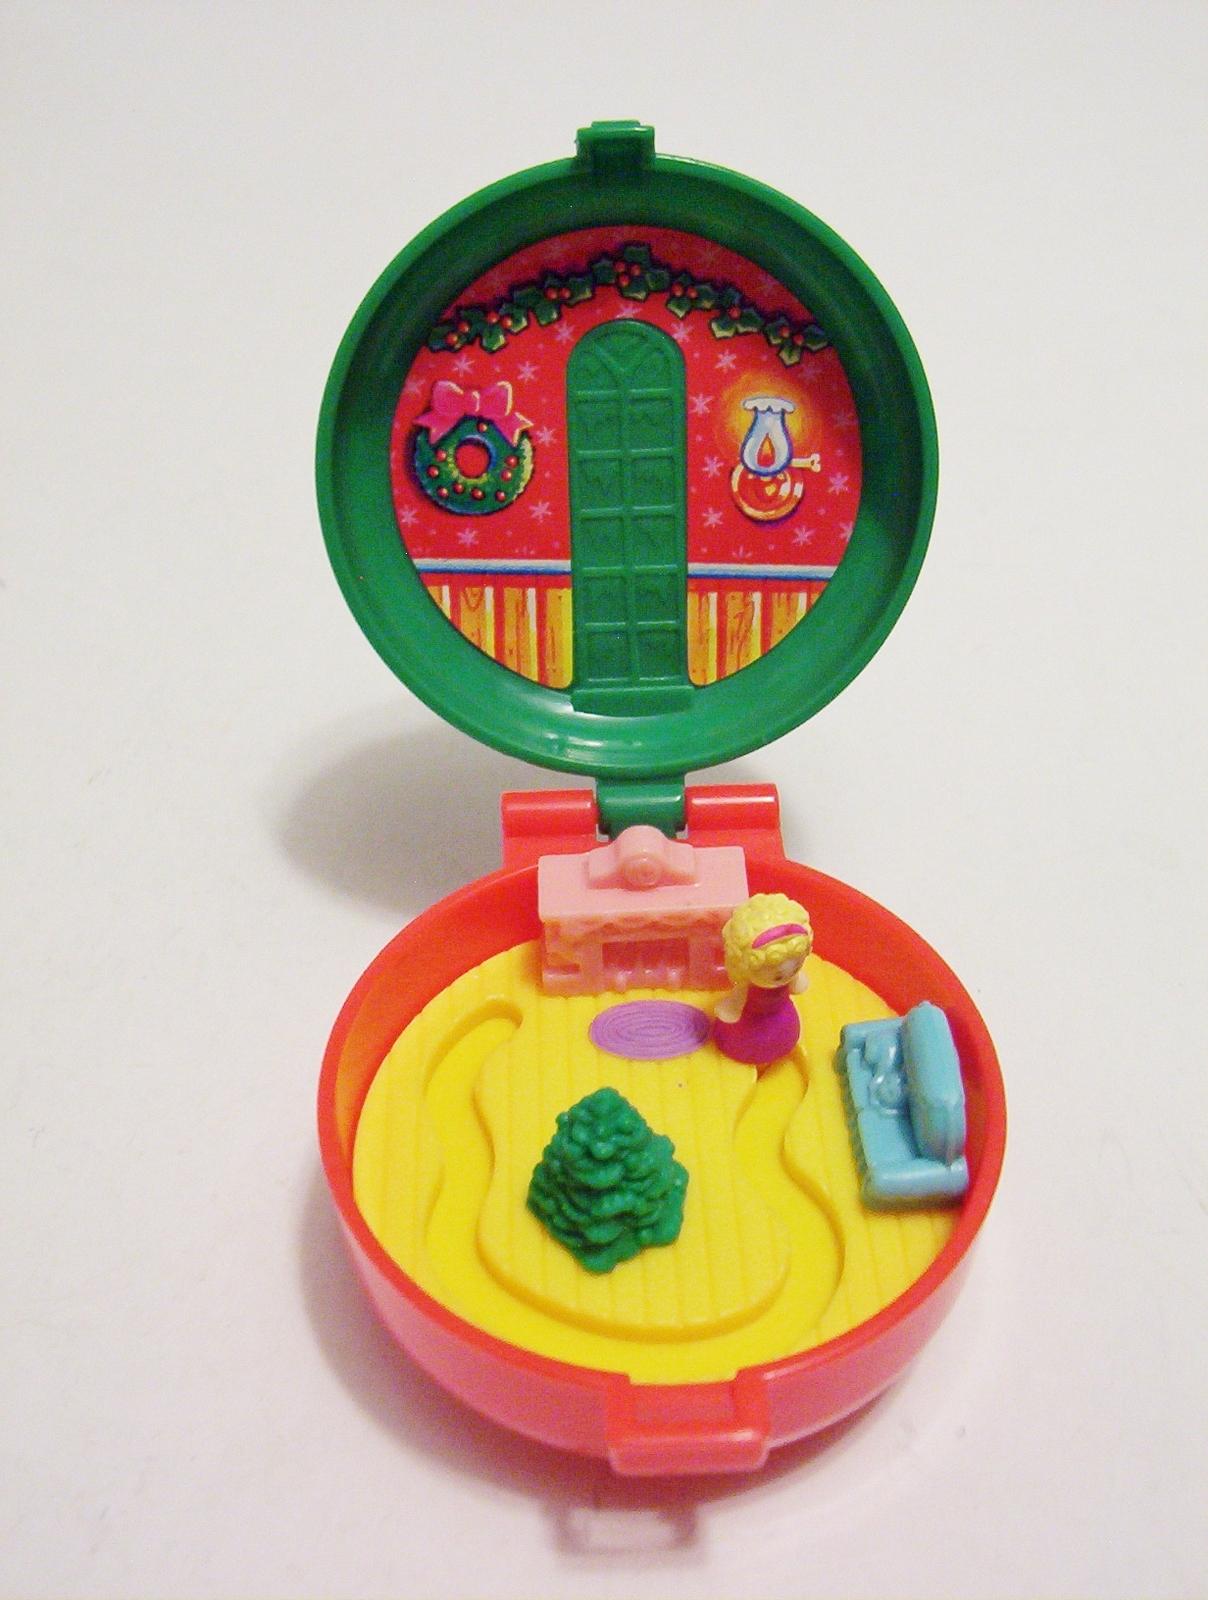 Polly Pocket Christmas Wreath Compact Bluebird Totally Toy Holiday McDonald 1993